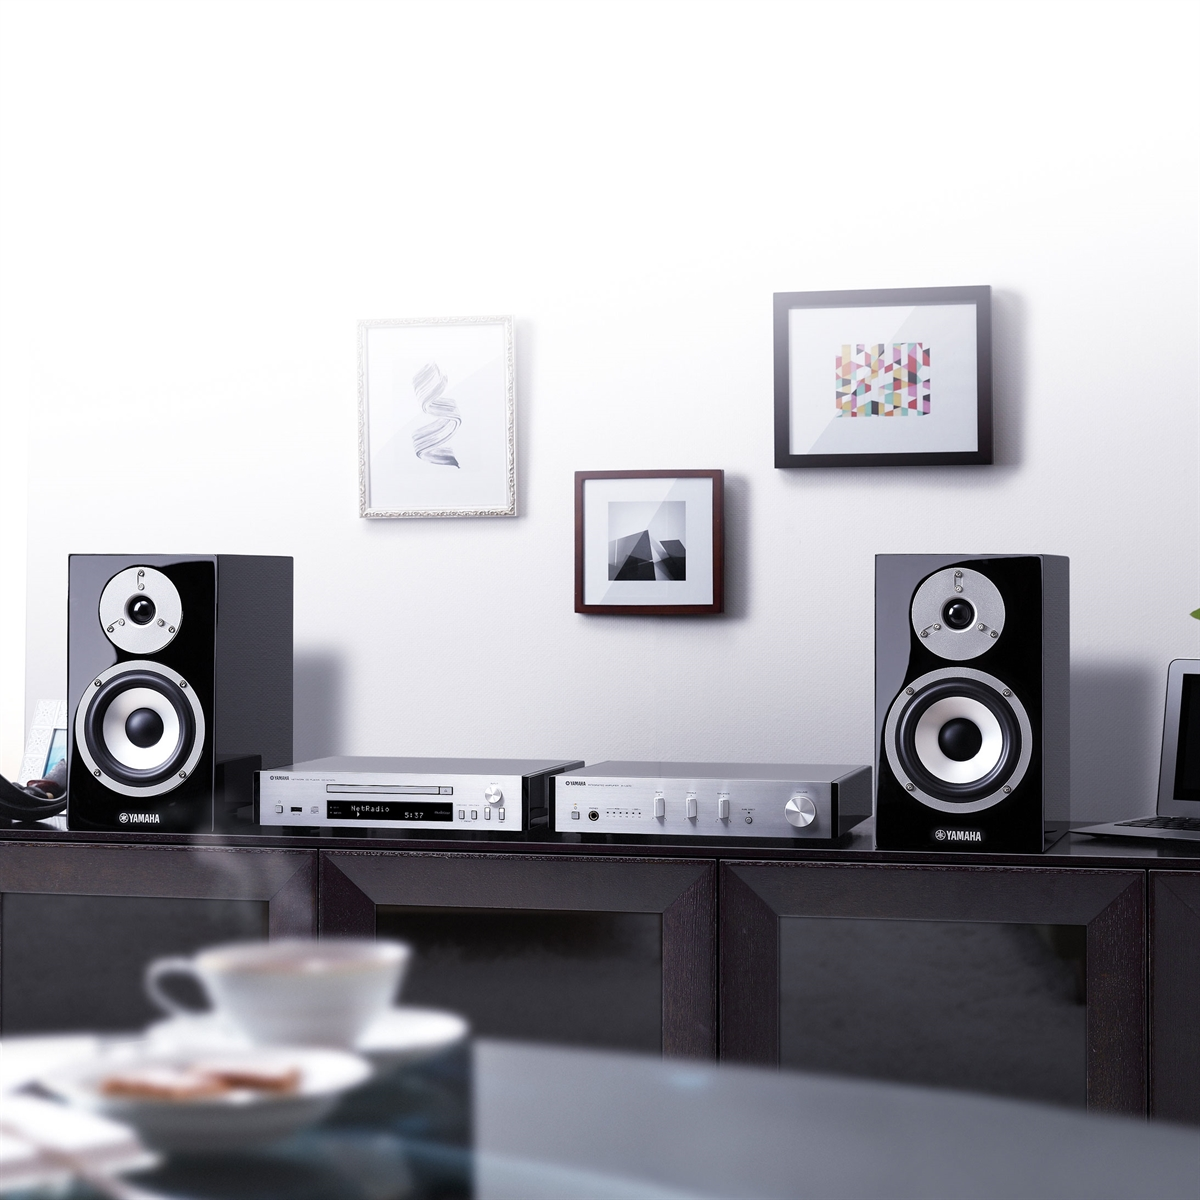 yamaha mcr n870d mini hi fi anl g. Black Bedroom Furniture Sets. Home Design Ideas